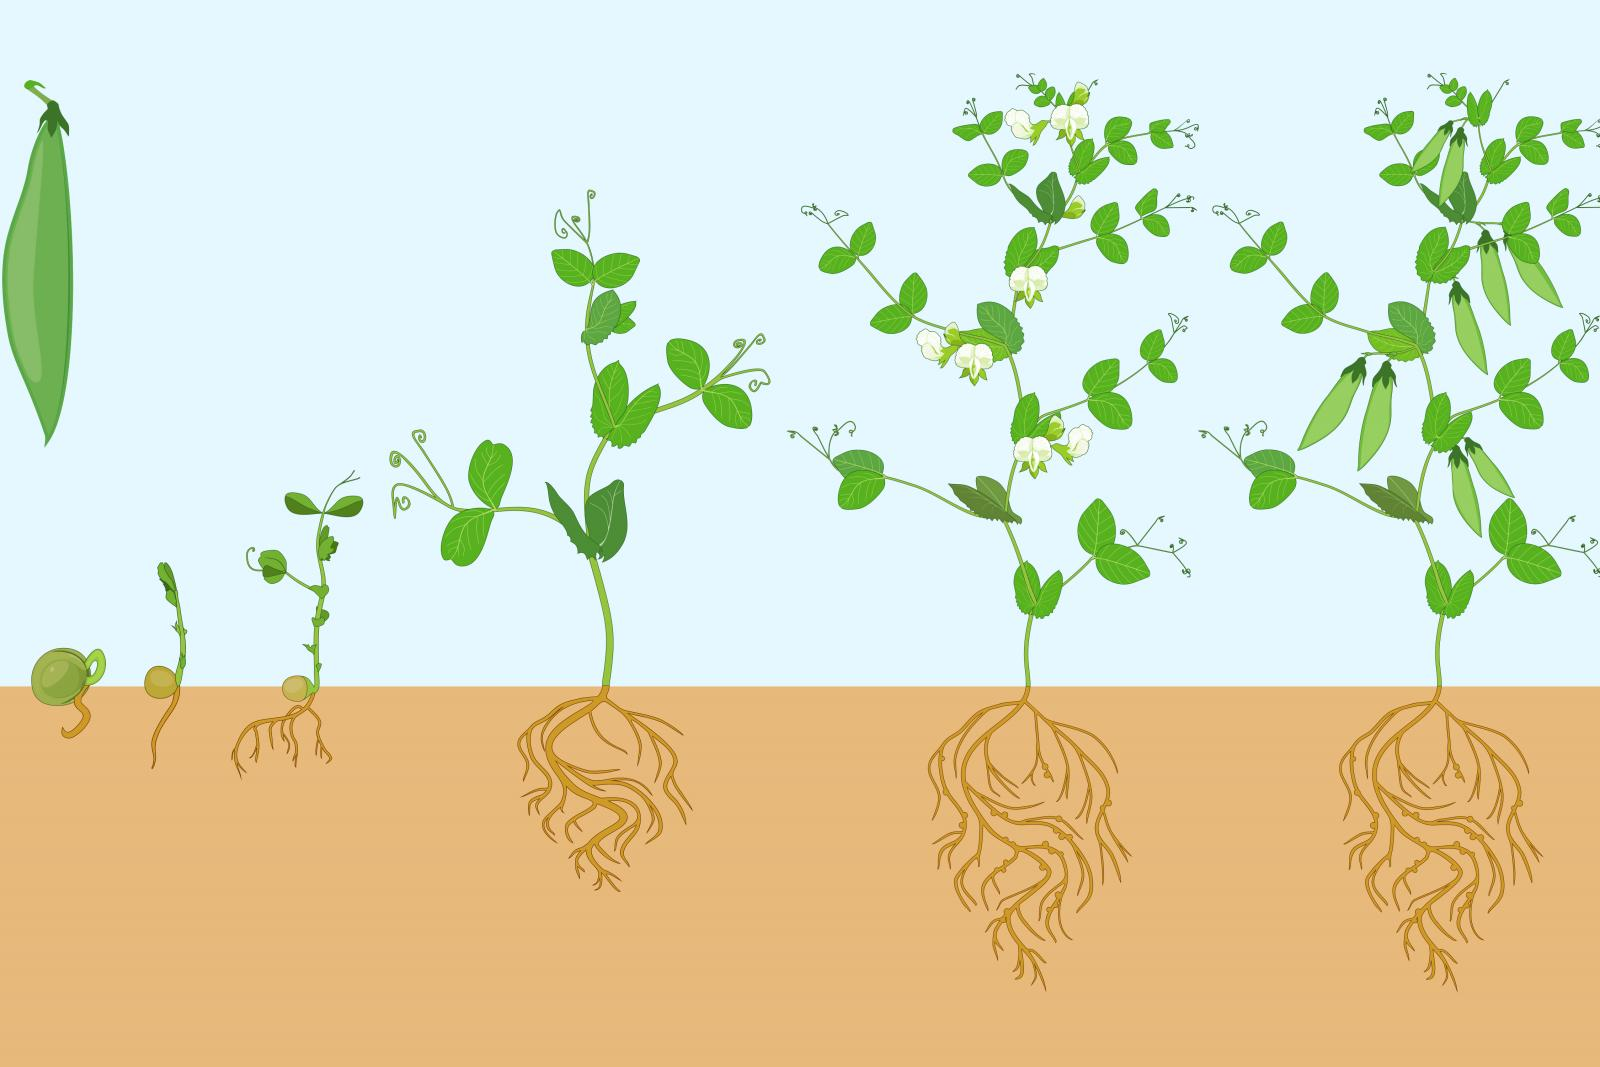 Life Cycle Bean Plant | LoveToKnow